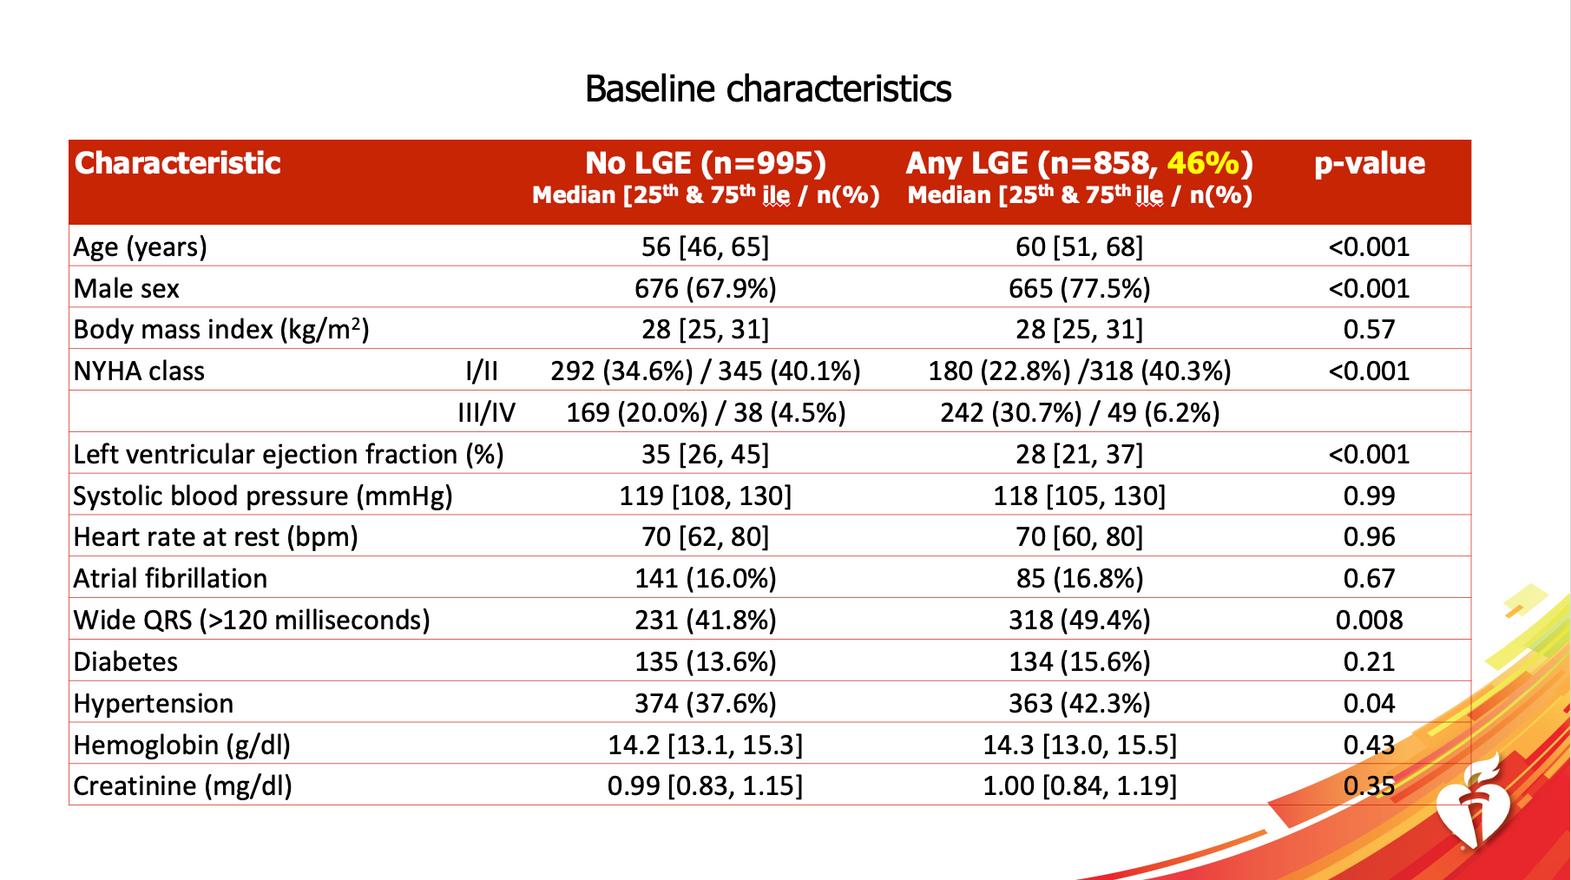 Baseline clinical